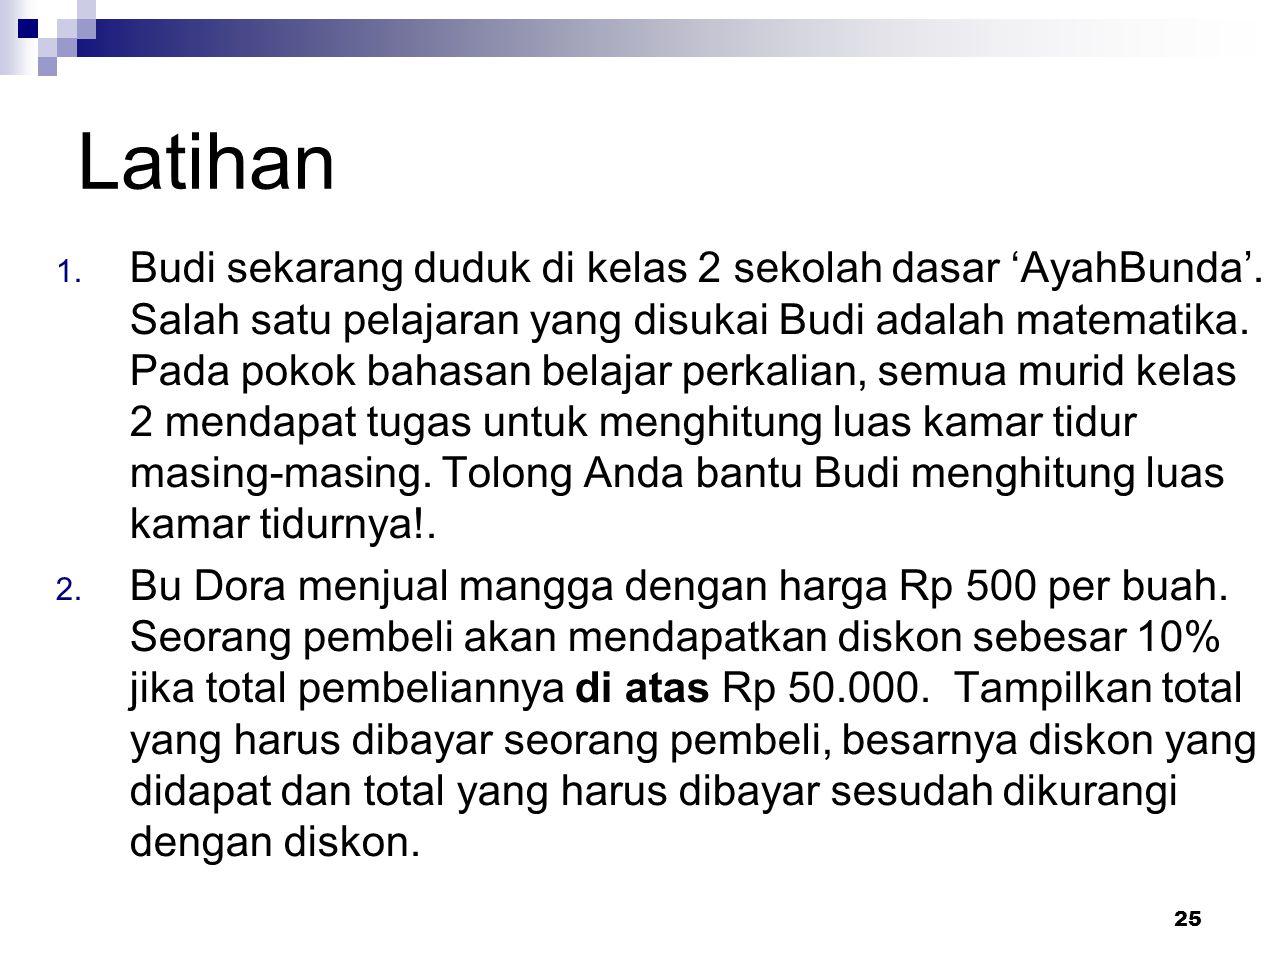 25 Latihan 1. Budi sekarang duduk di kelas 2 sekolah dasar 'AyahBunda'. Salah satu pelajaran yang disukai Budi adalah matematika. Pada pokok bahasan b